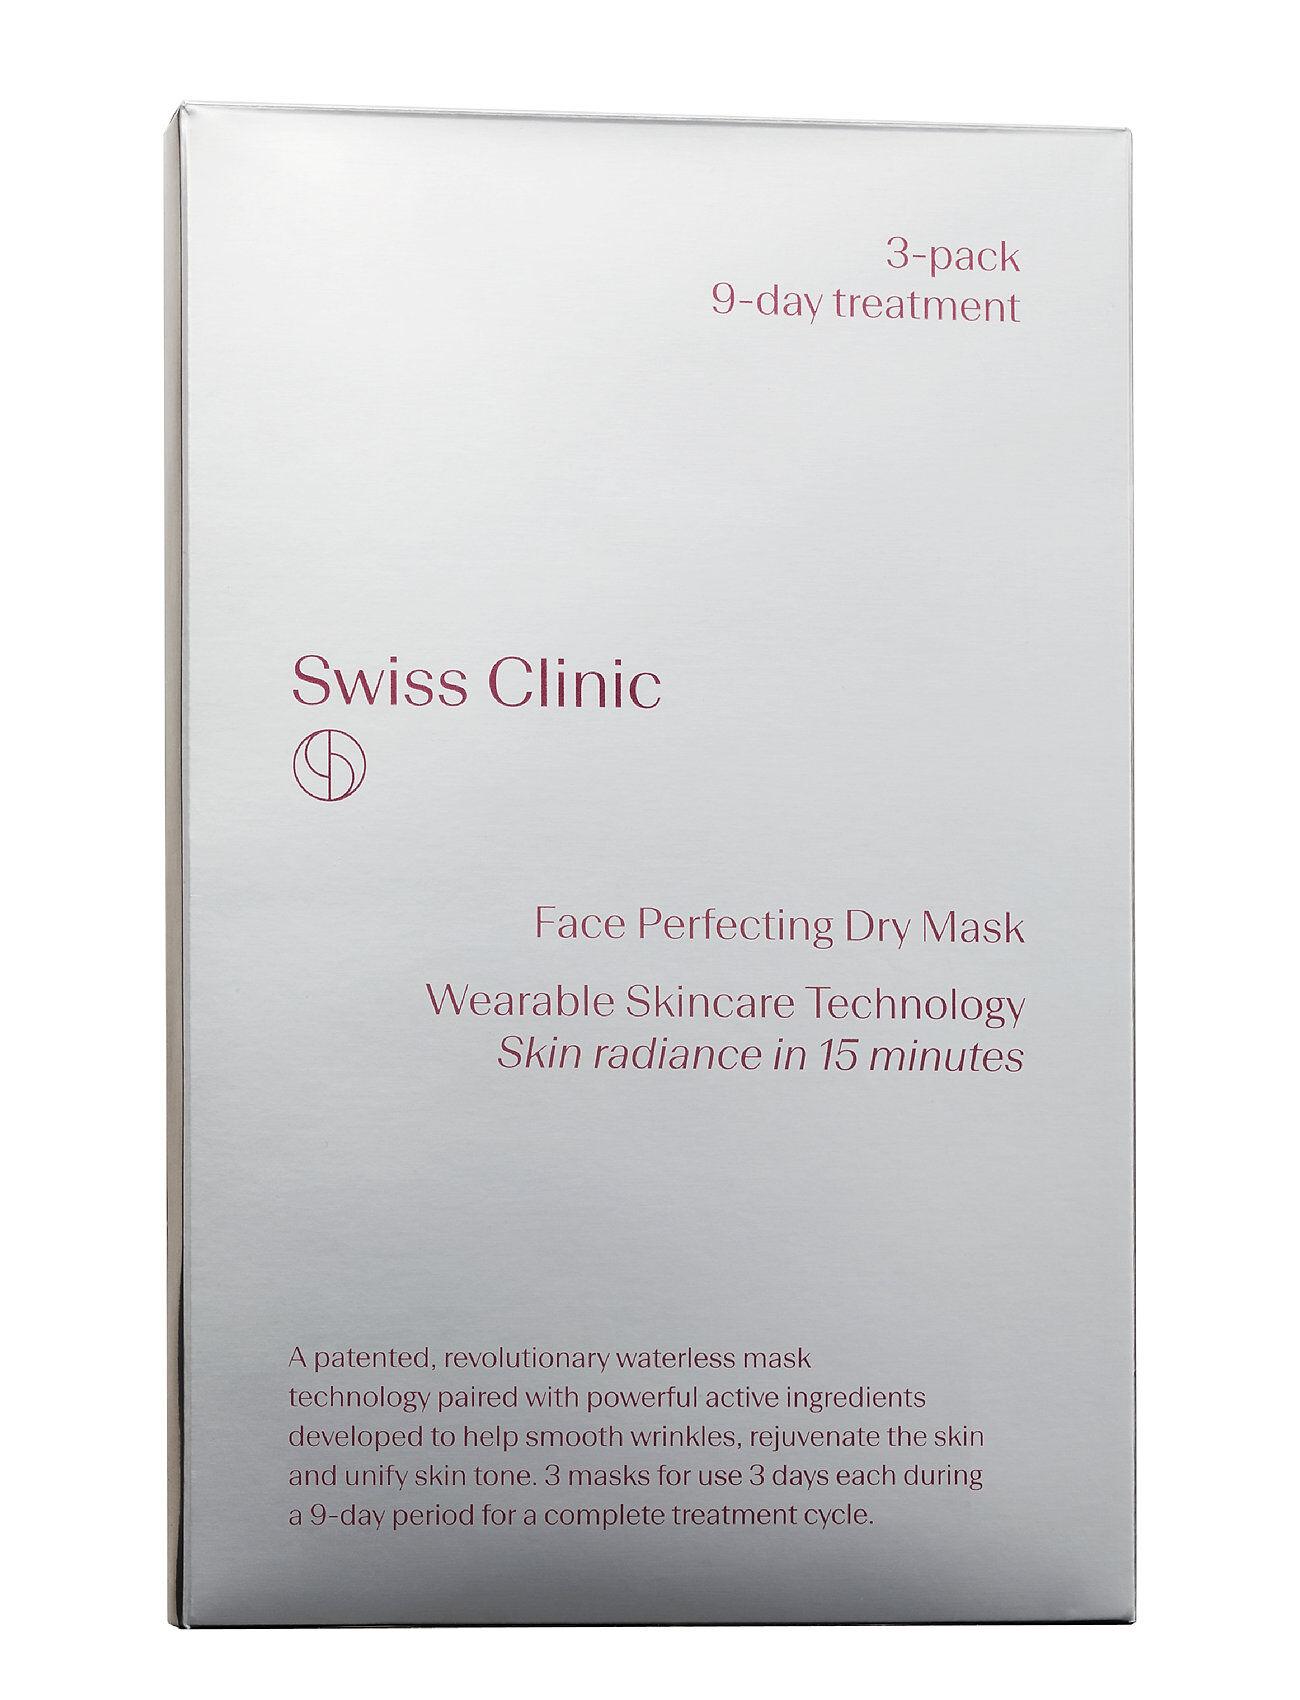 Swiss Clinic Face Dry Mask Treatment Beauty WOMEN Skin Care Face Sheet Mask Nude Swiss Clinic